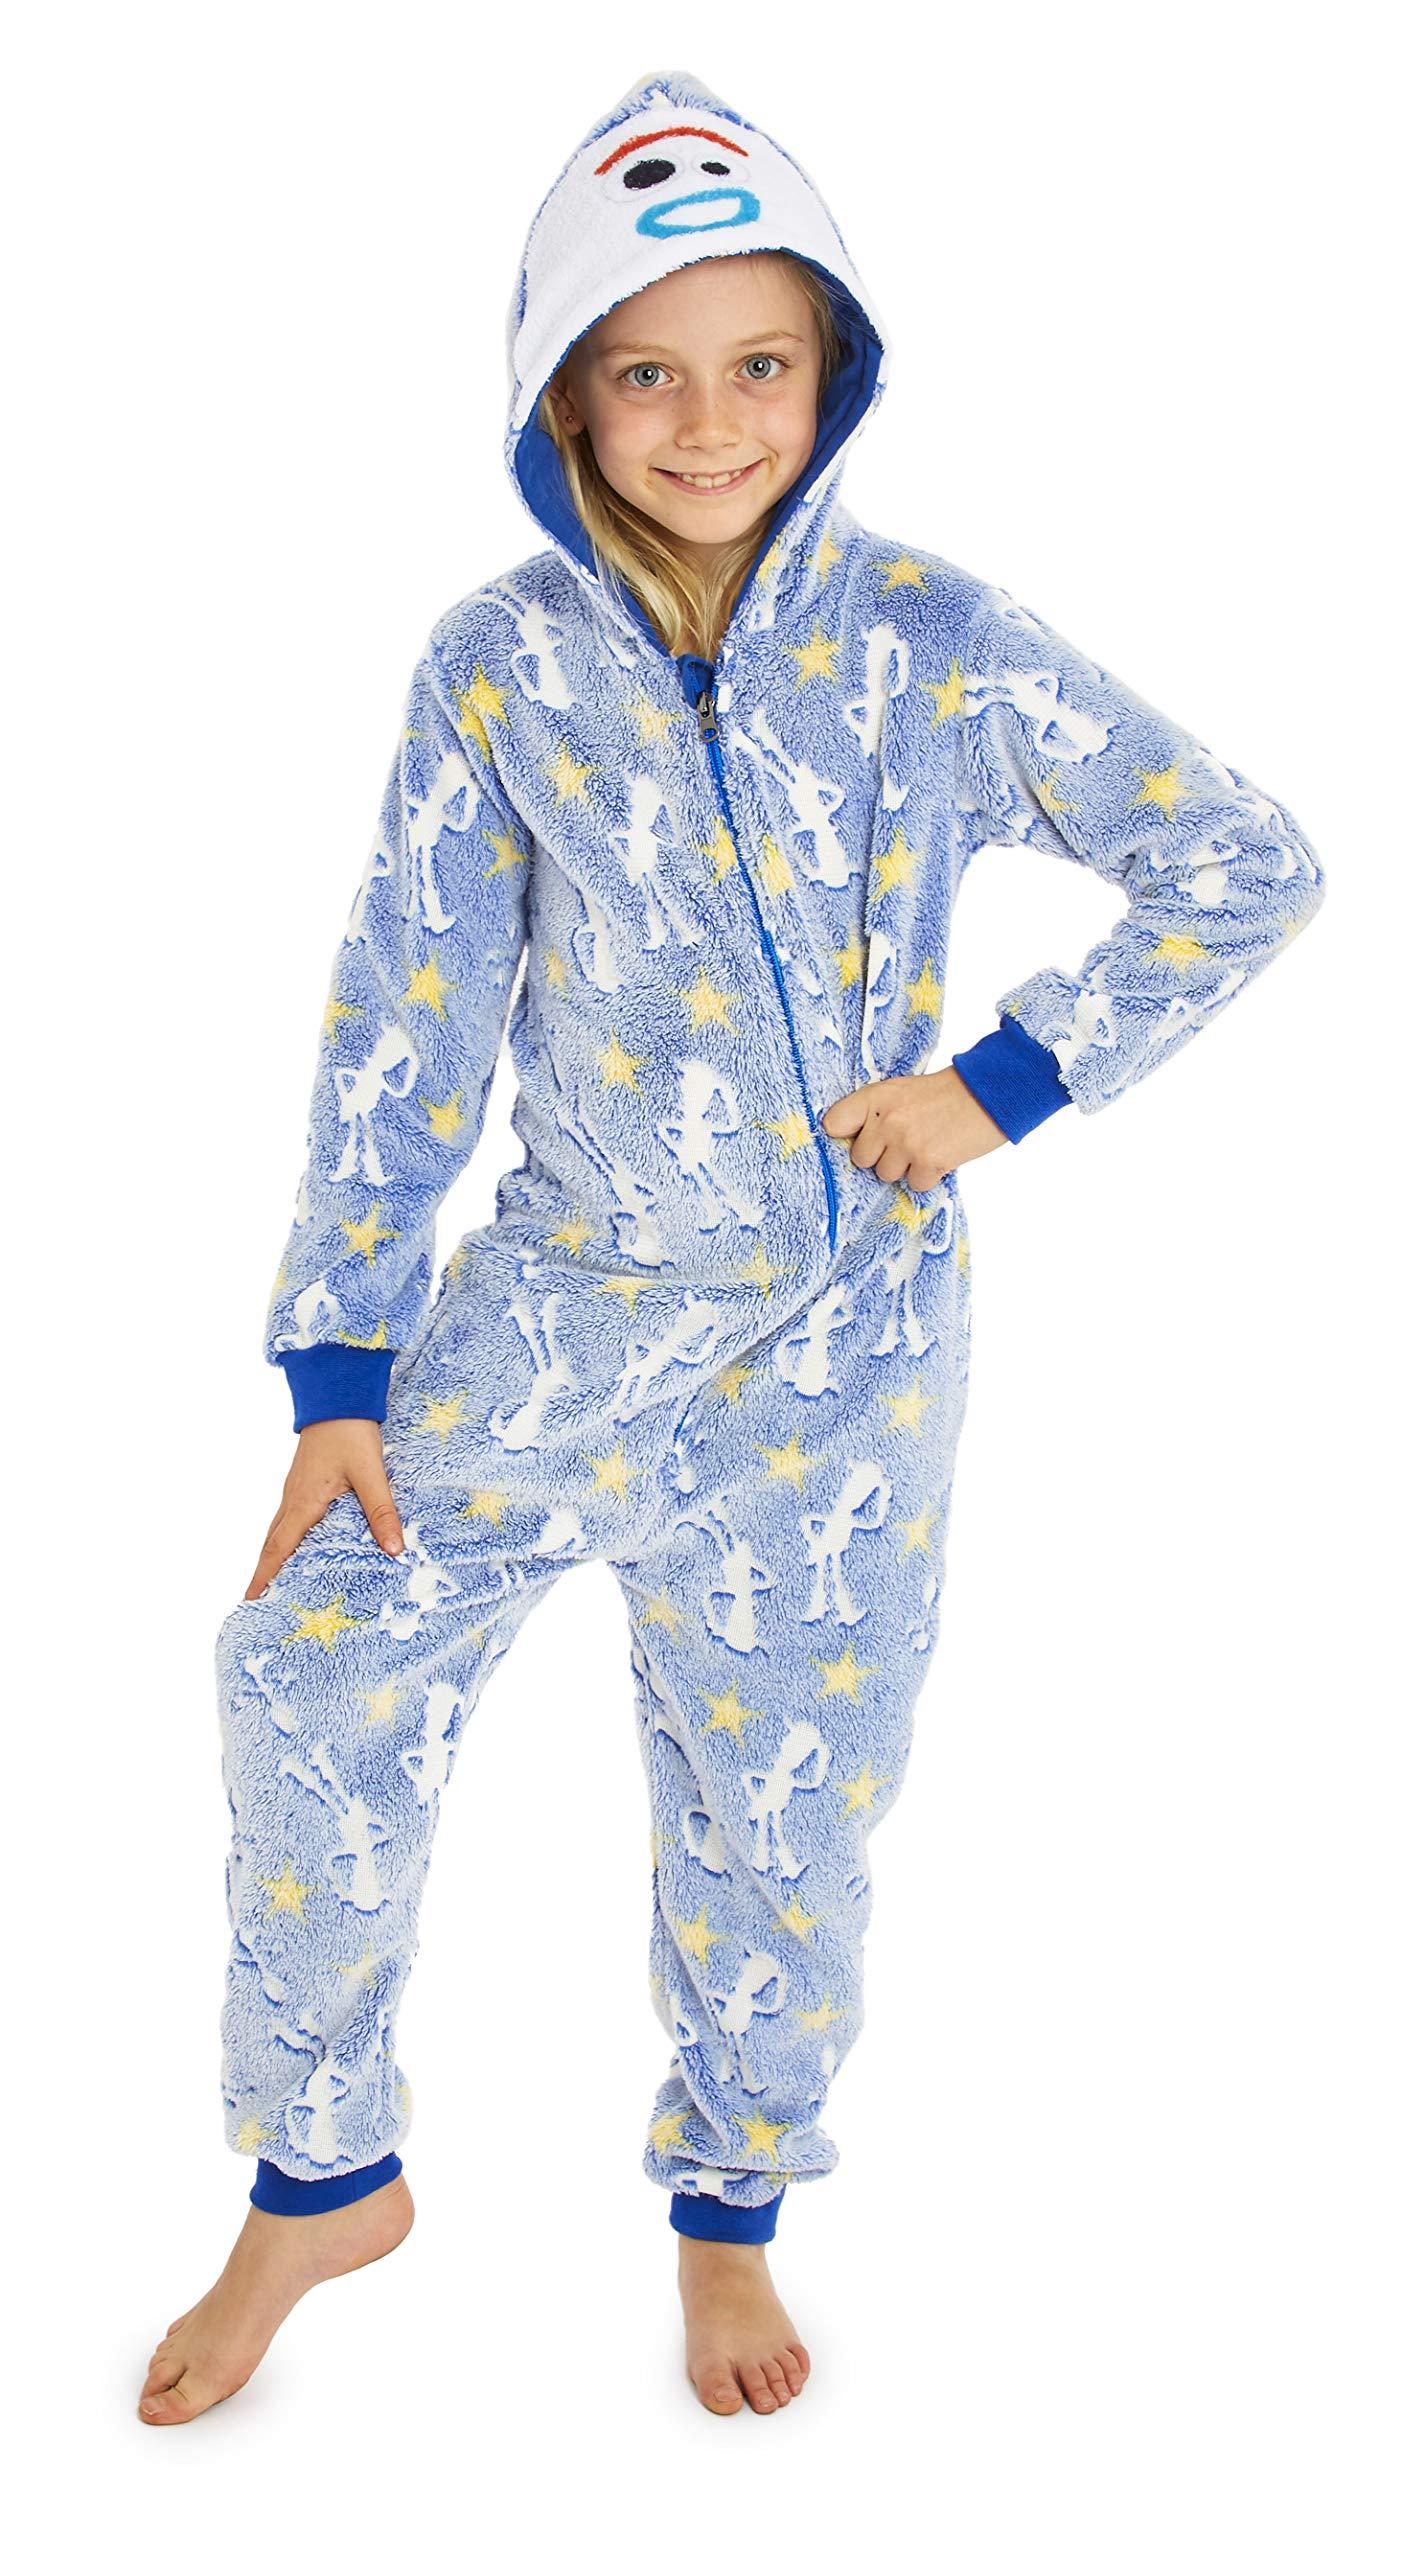 Disney Toy Story 4 Forky Onesie Glow in The Dark Onesie Hooded Gifts For Kids Super Soft Fleece Onesies For Boys Toy Story Pyjamas PJs Playsuit Costume 7//8 Years, Glow in the Dark Woody